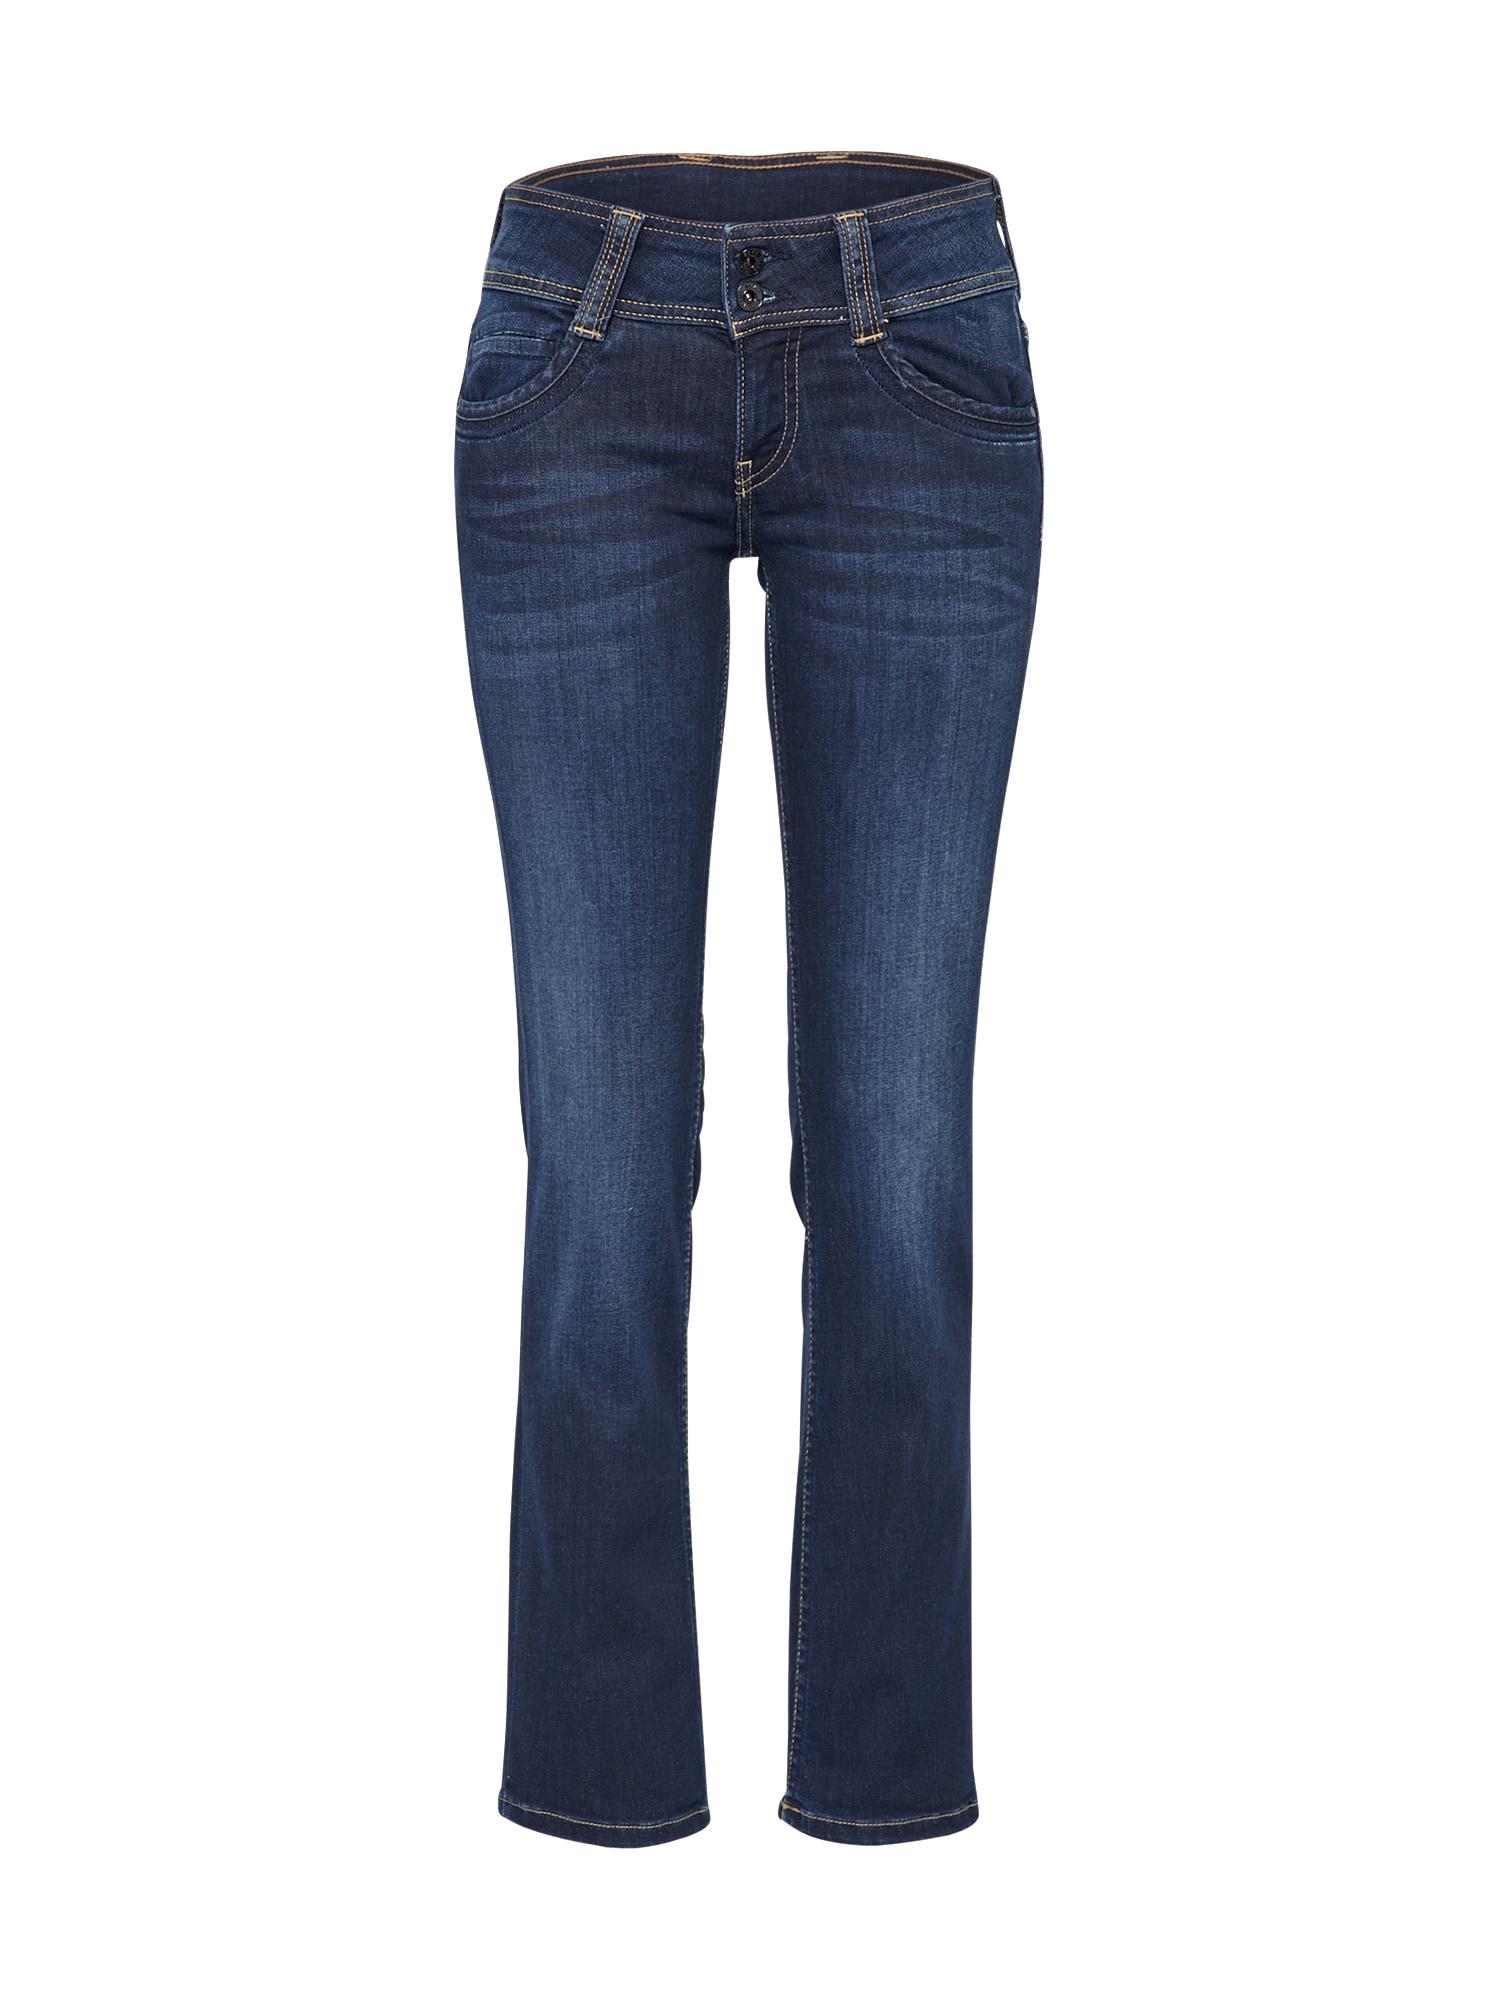 Pepe Jeans Dames Jeans Gen blue denim